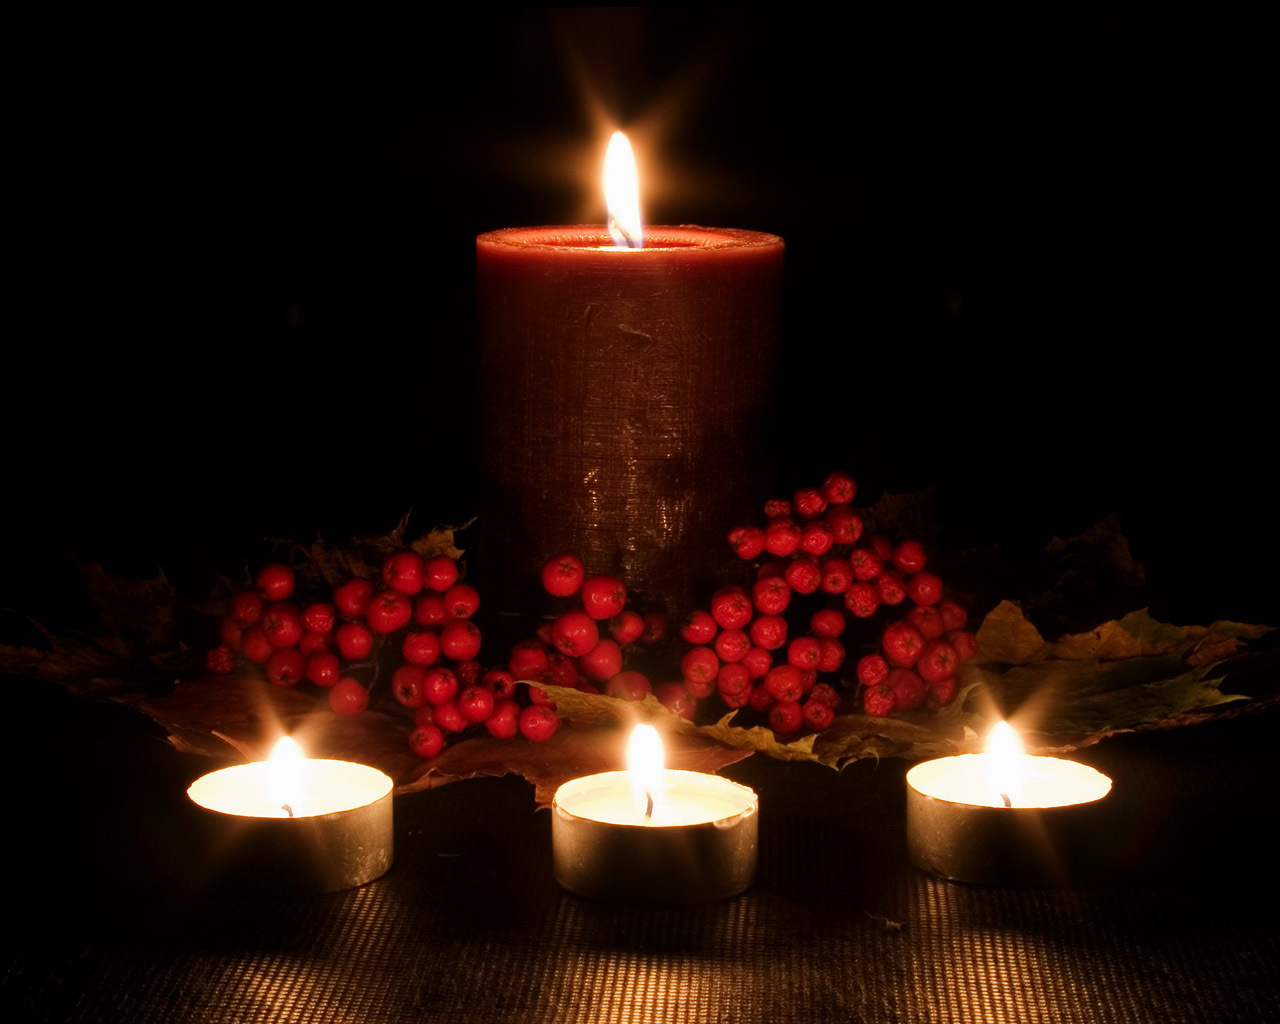 Free Animated Fireplace Wallpaper Flickering Firelight Candles Wallpaper 22611292 Fanpop